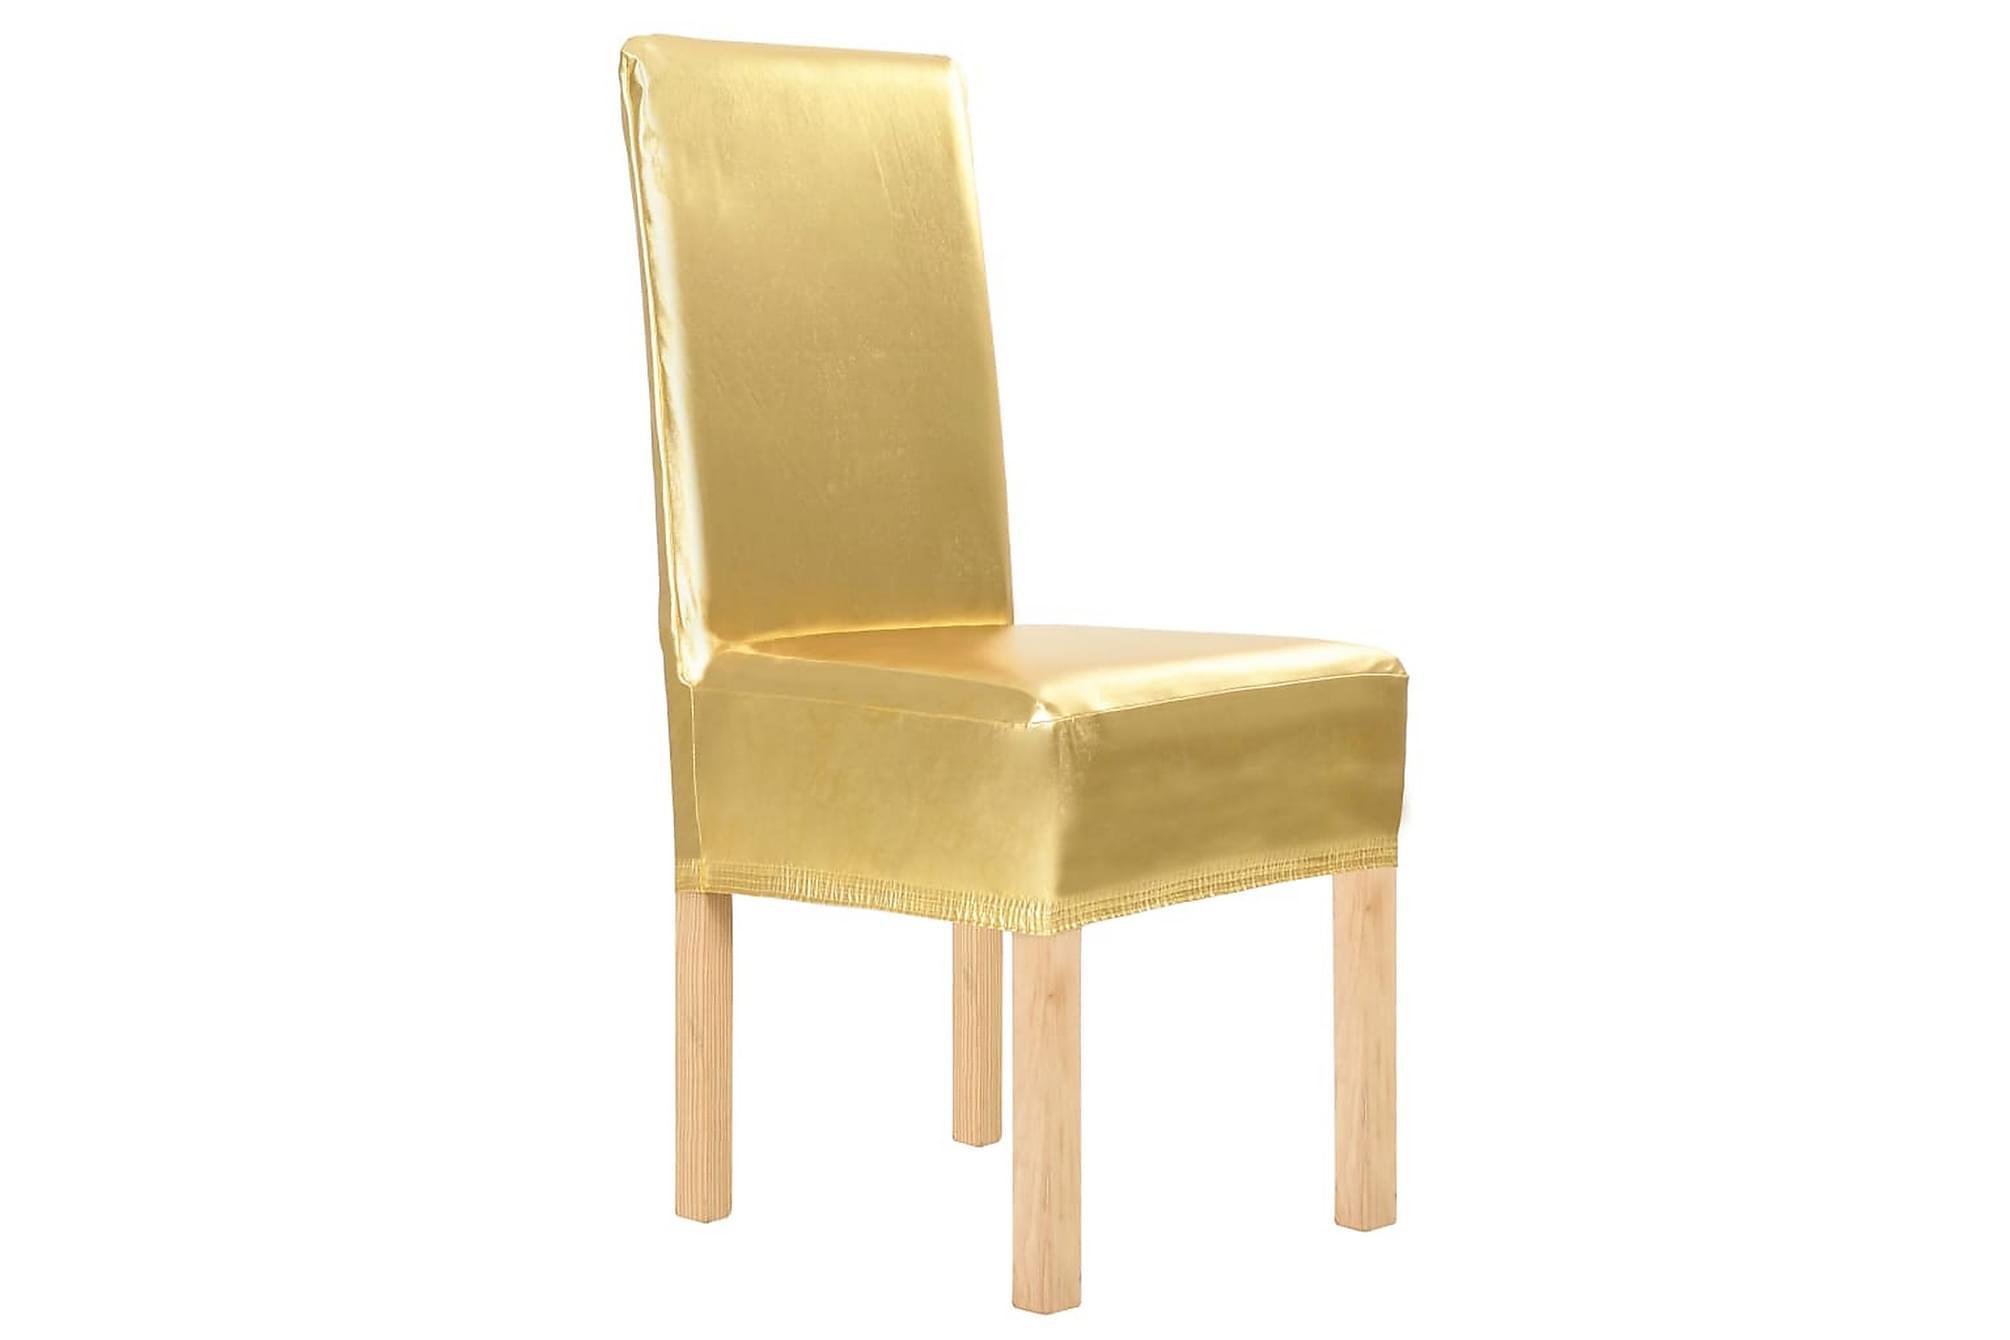 4 st Raka stolsöverdrag stretch guld